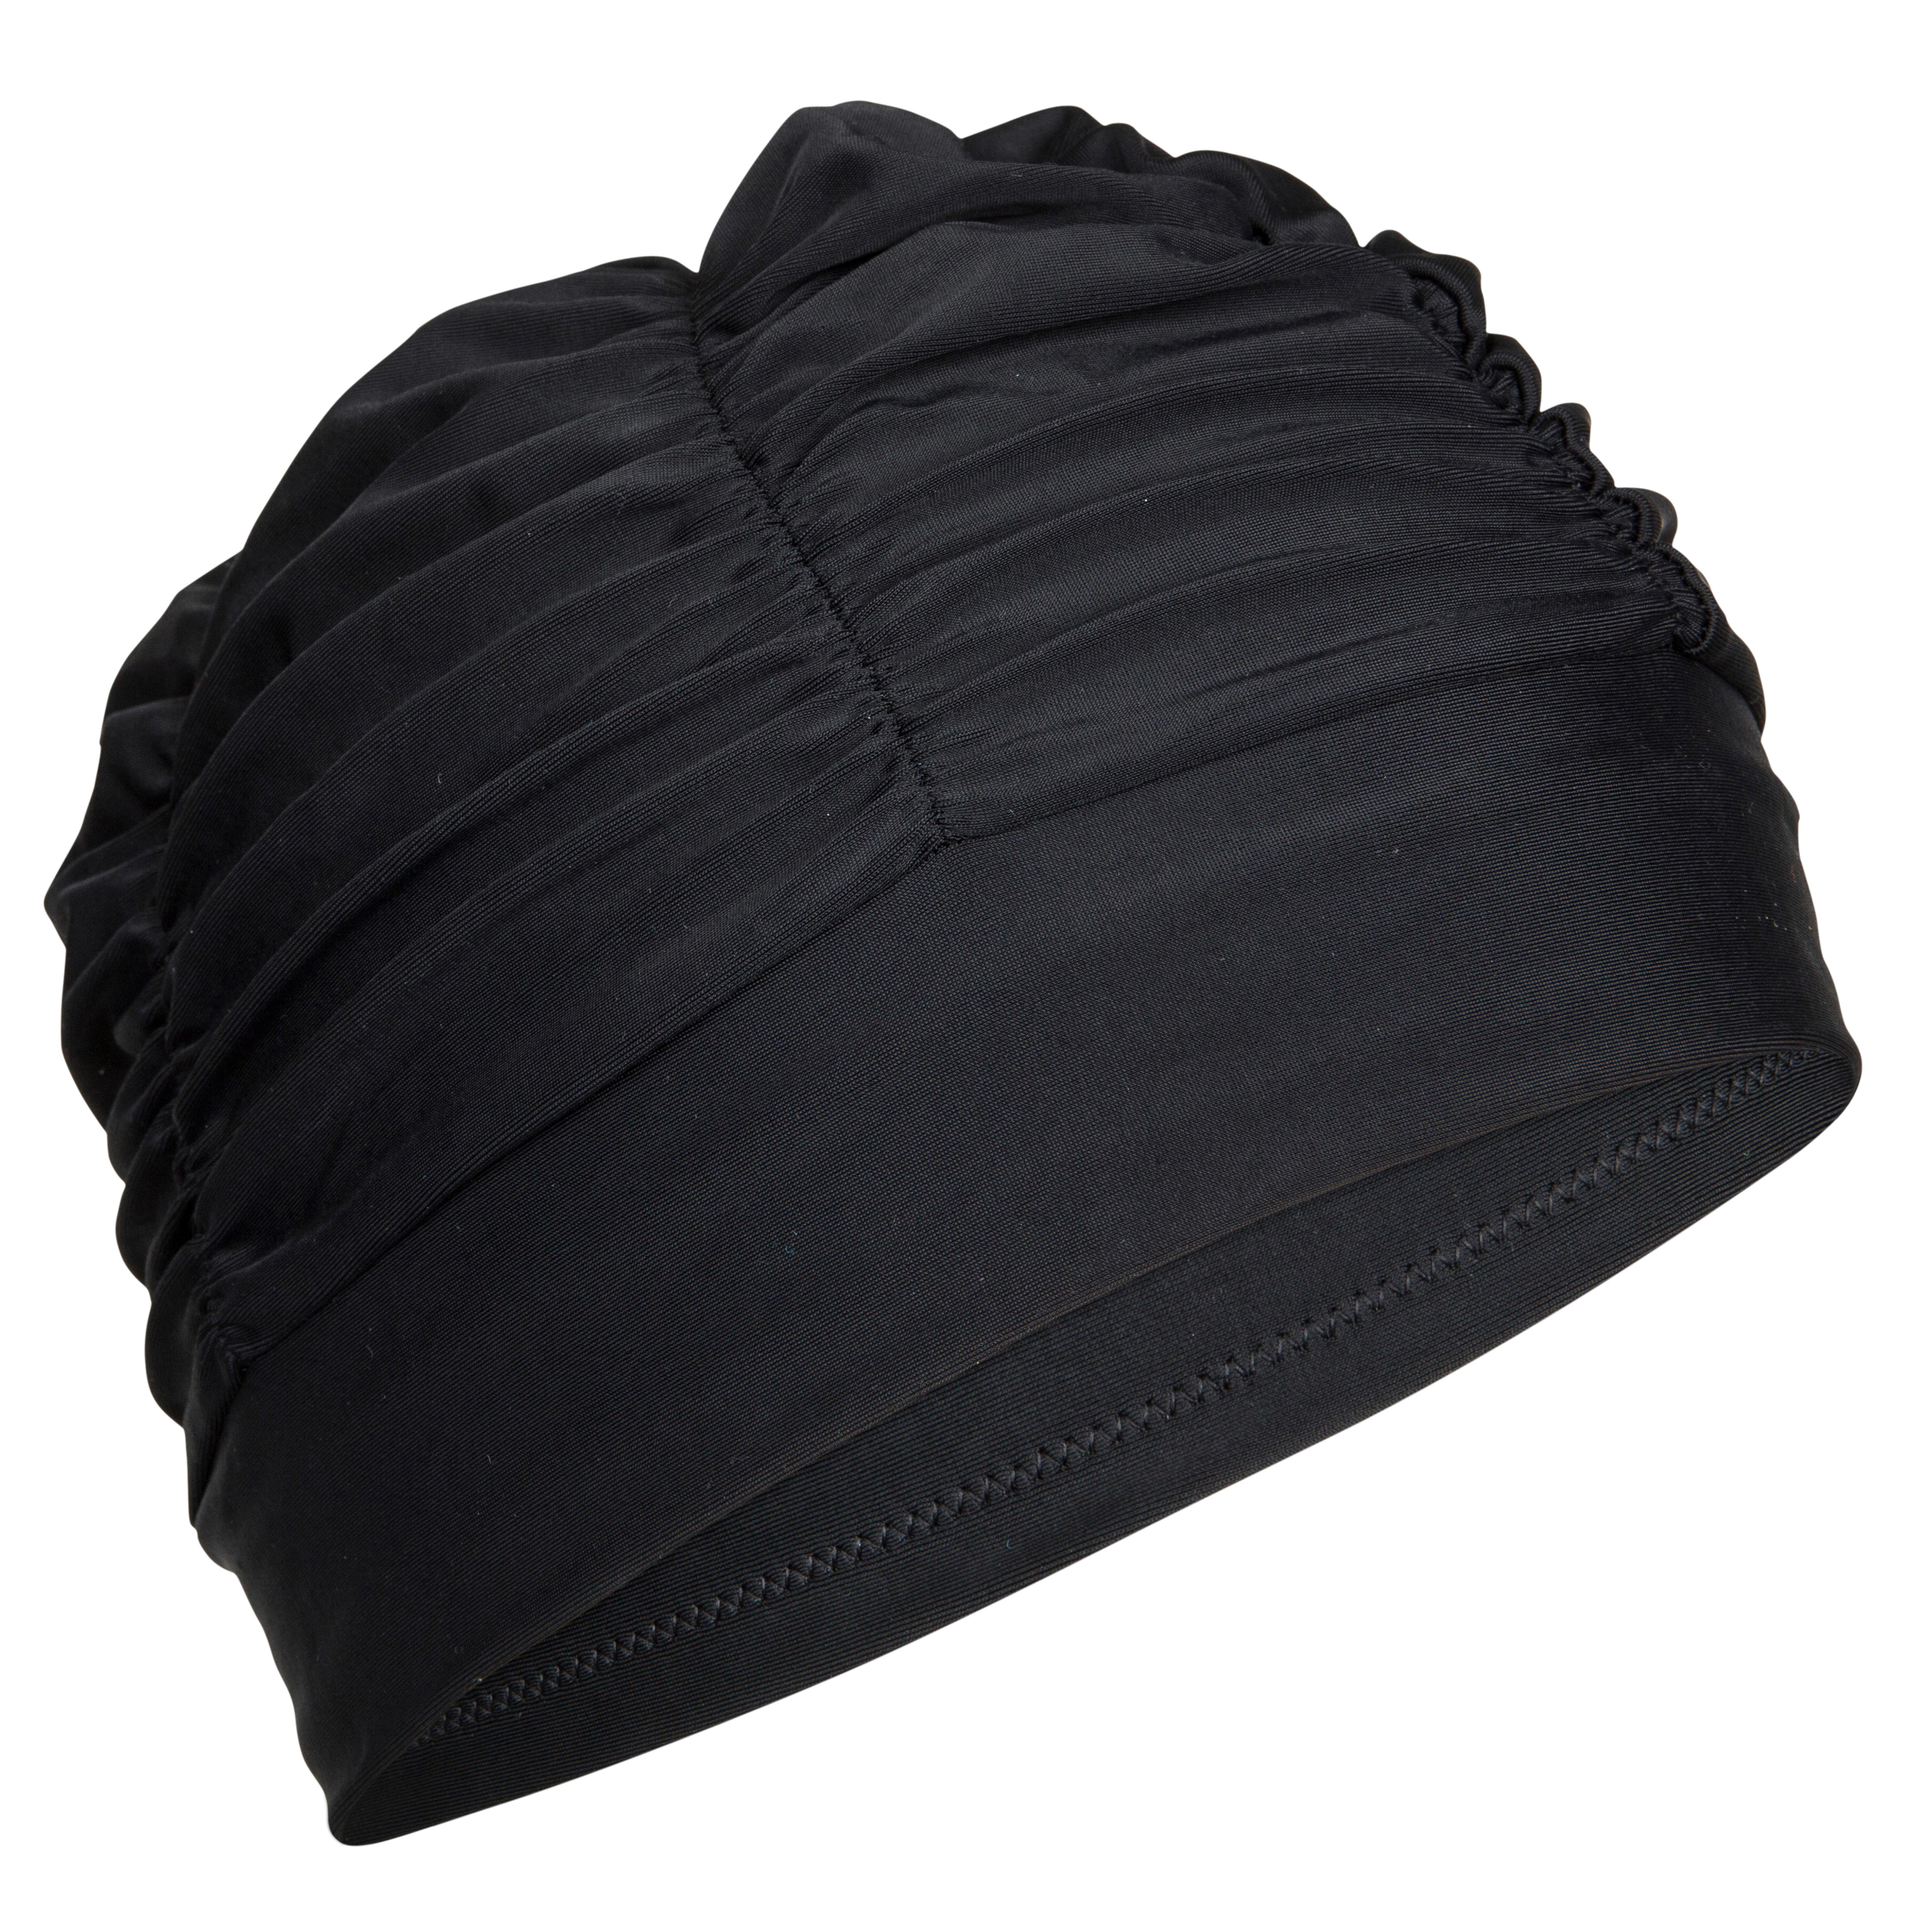 Badekappe Stoff Volumen schwarz